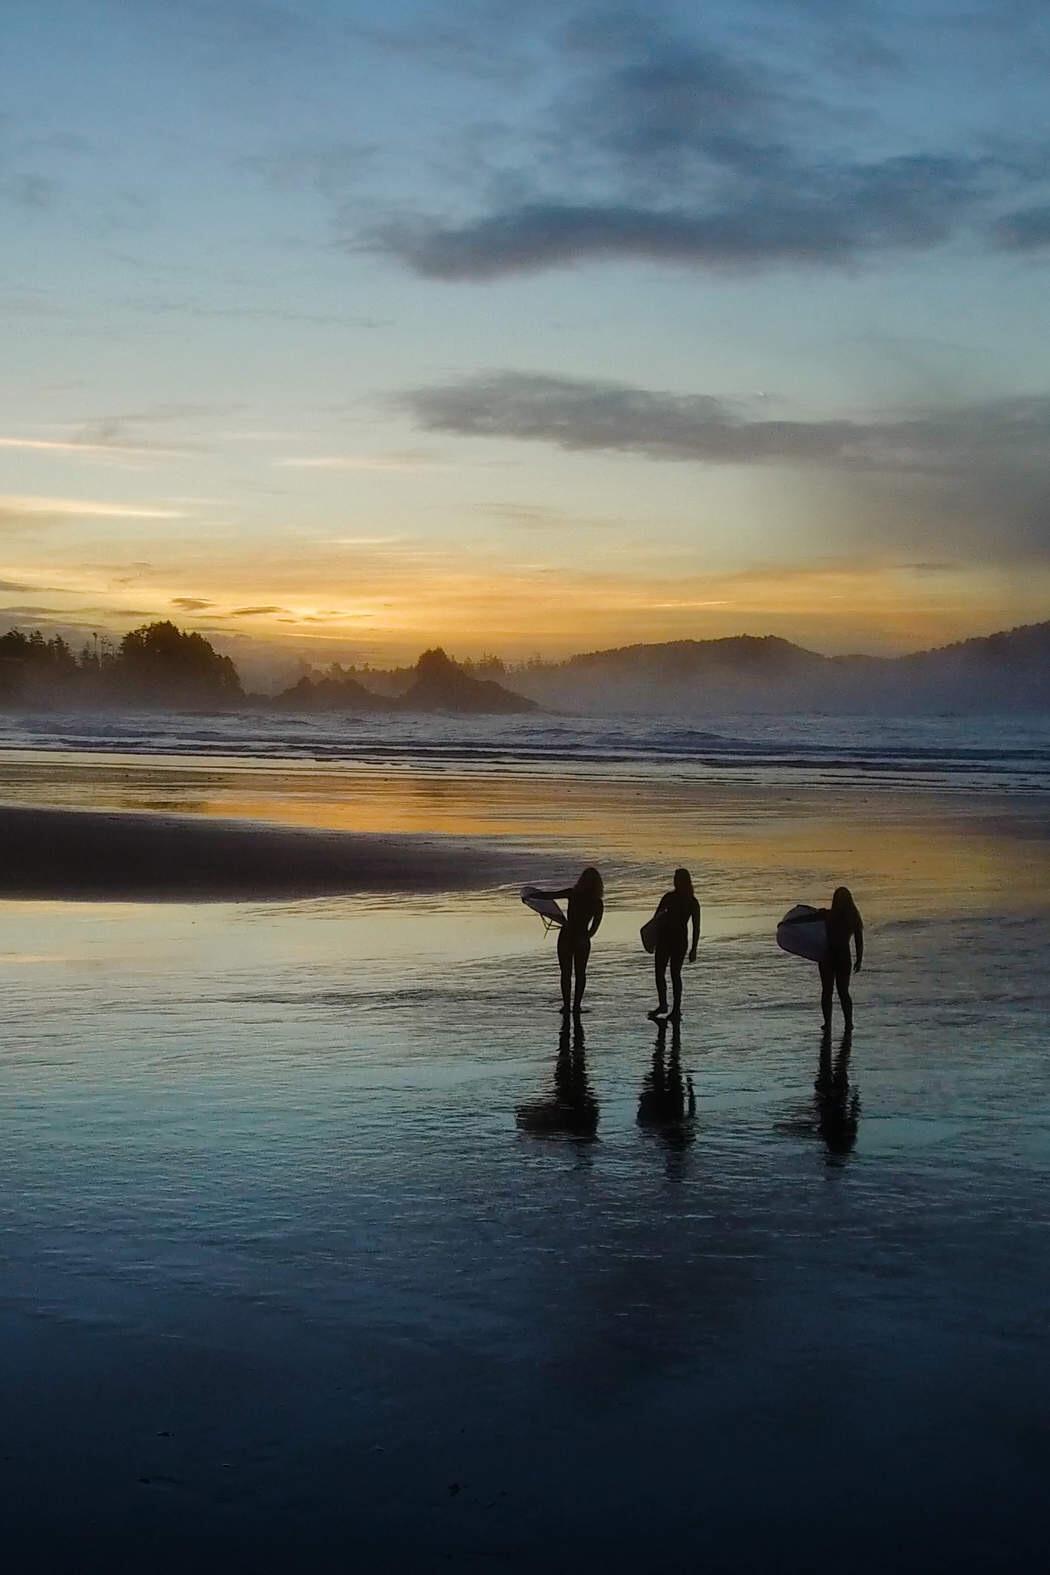 Surfing in Tofino, al oeste de la Isla Vancouver, Canadá. Foto: Josh Haner / The New York Times